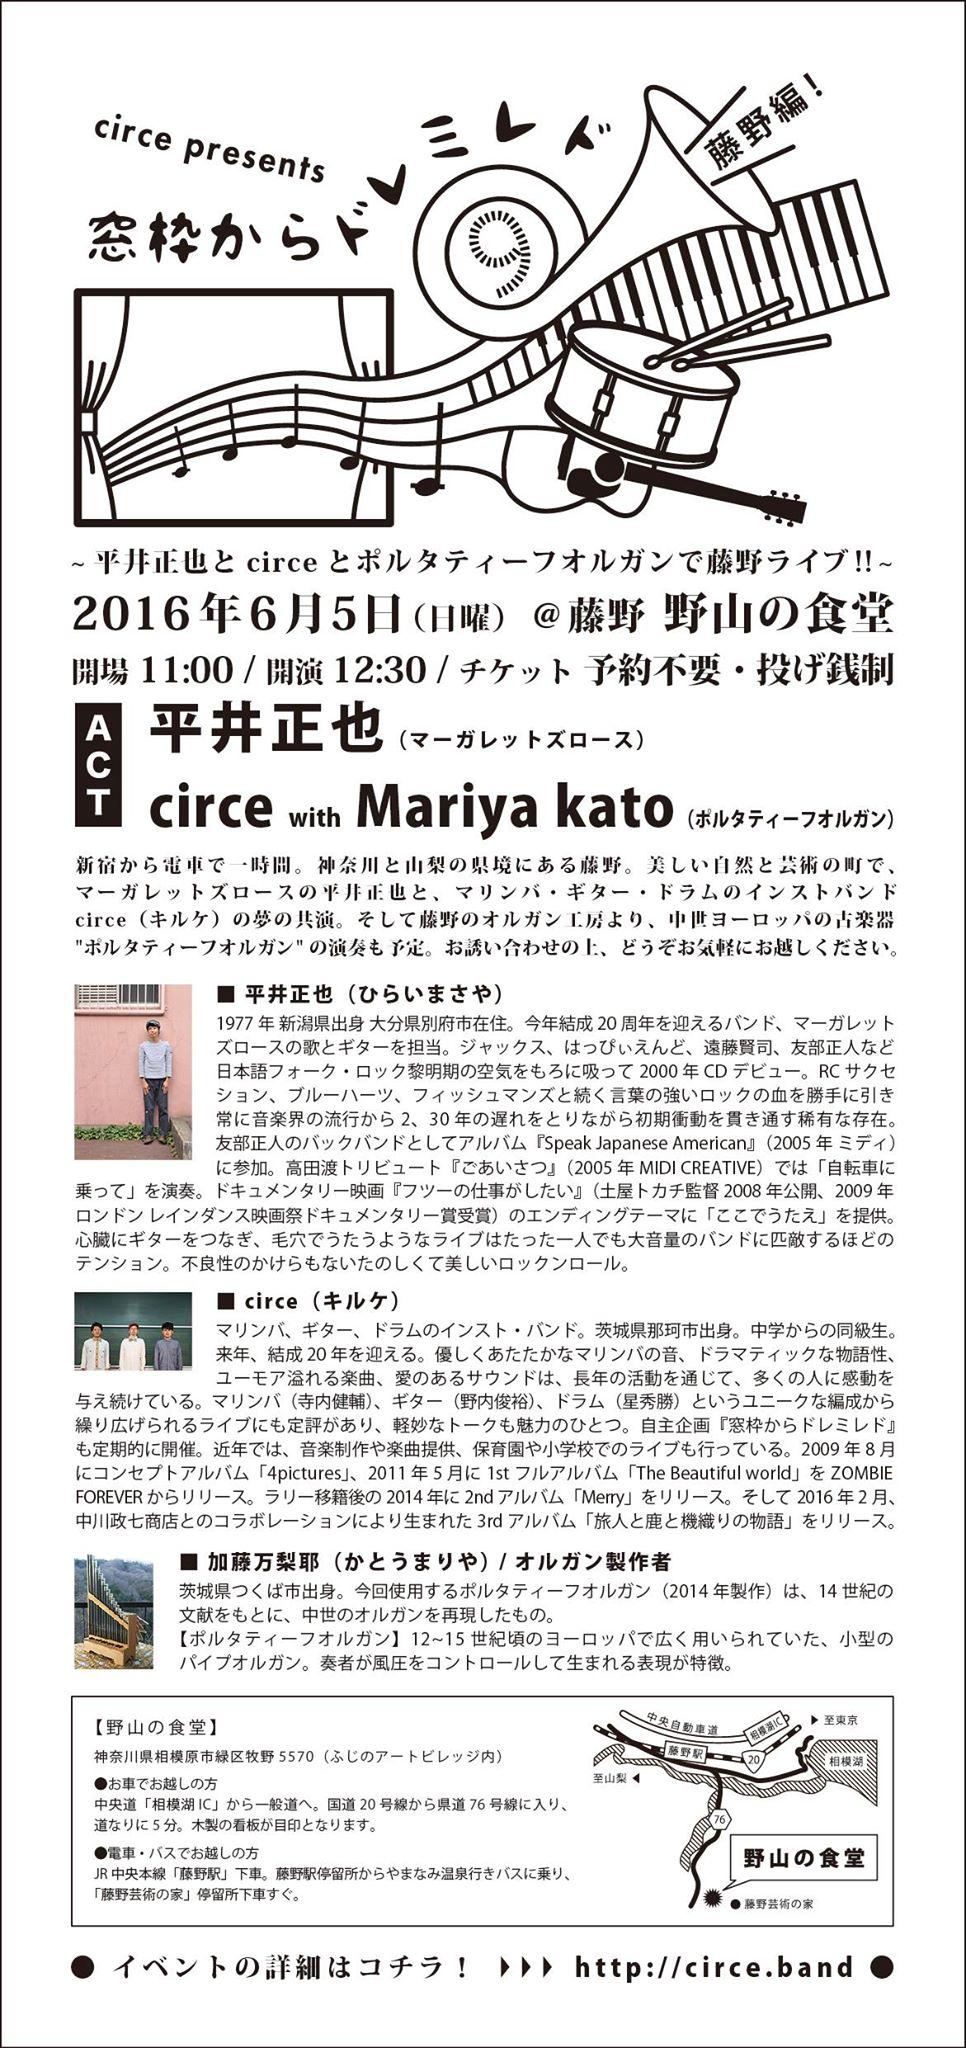 "circe presents ""窓枠からドレミレド vol.9"" 開催決定!"